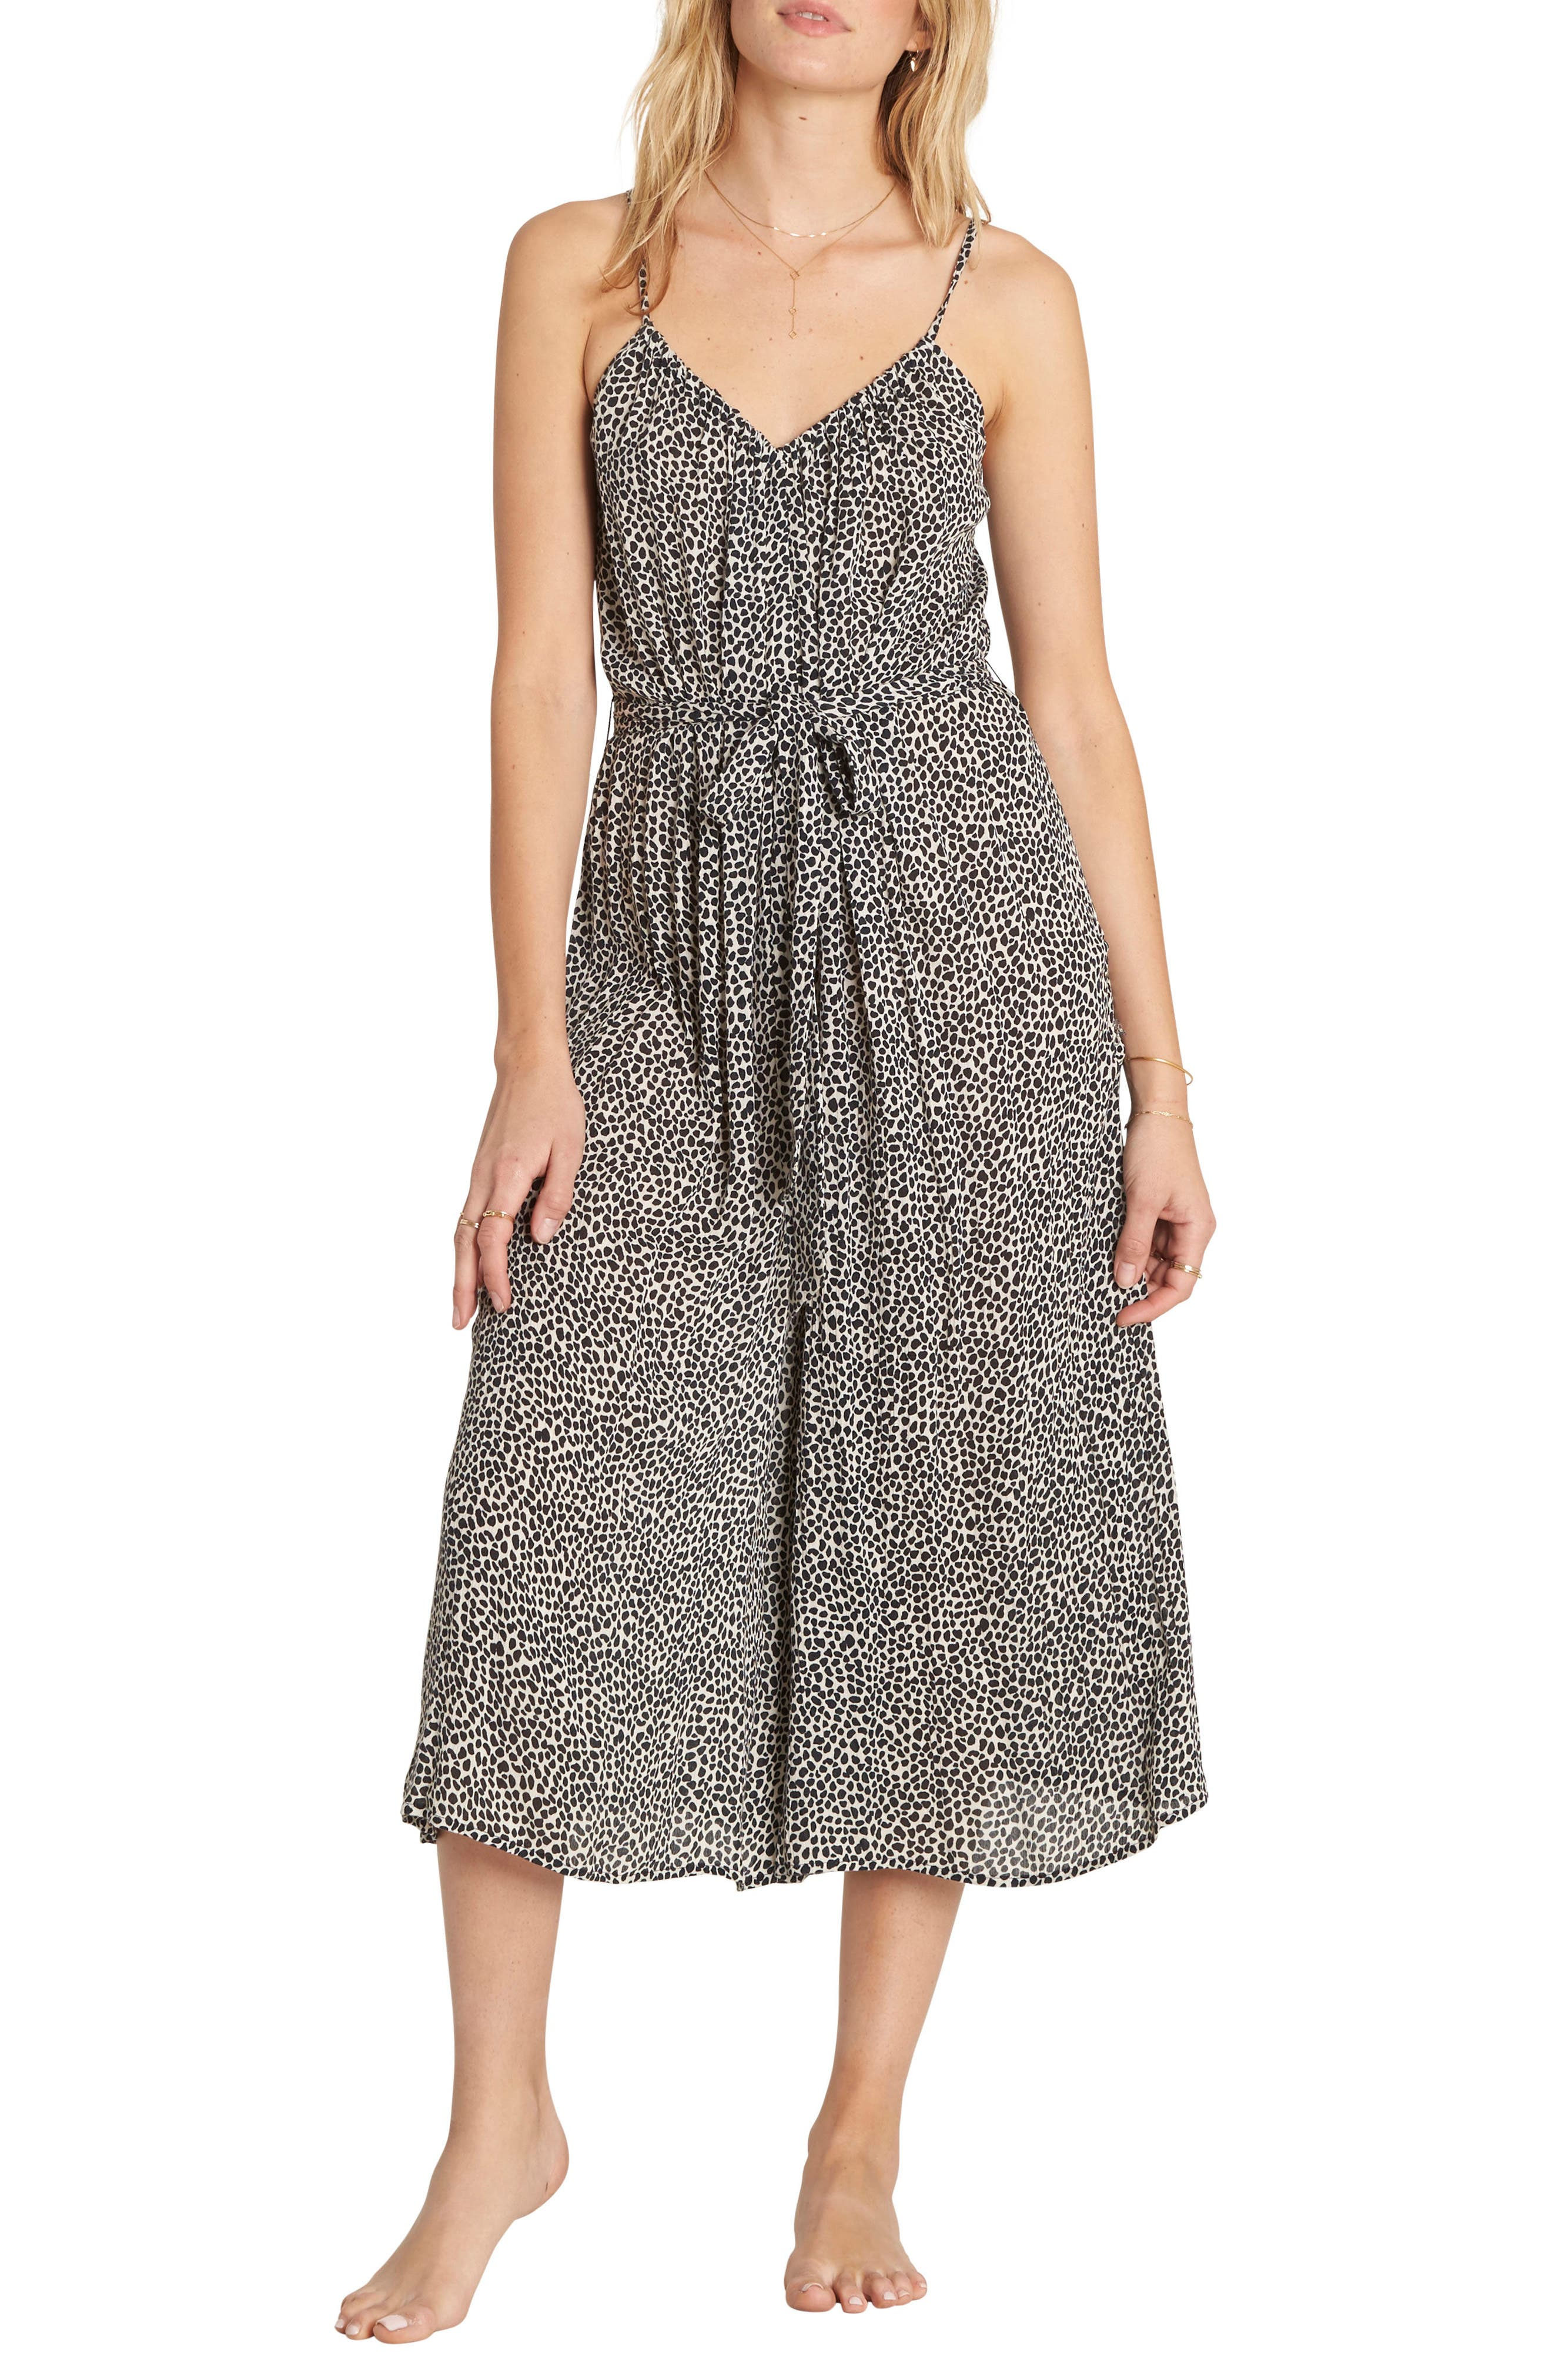 Alternate Image 1 Selected - Billabong Wild Hearts Tie Waist Midi Dress